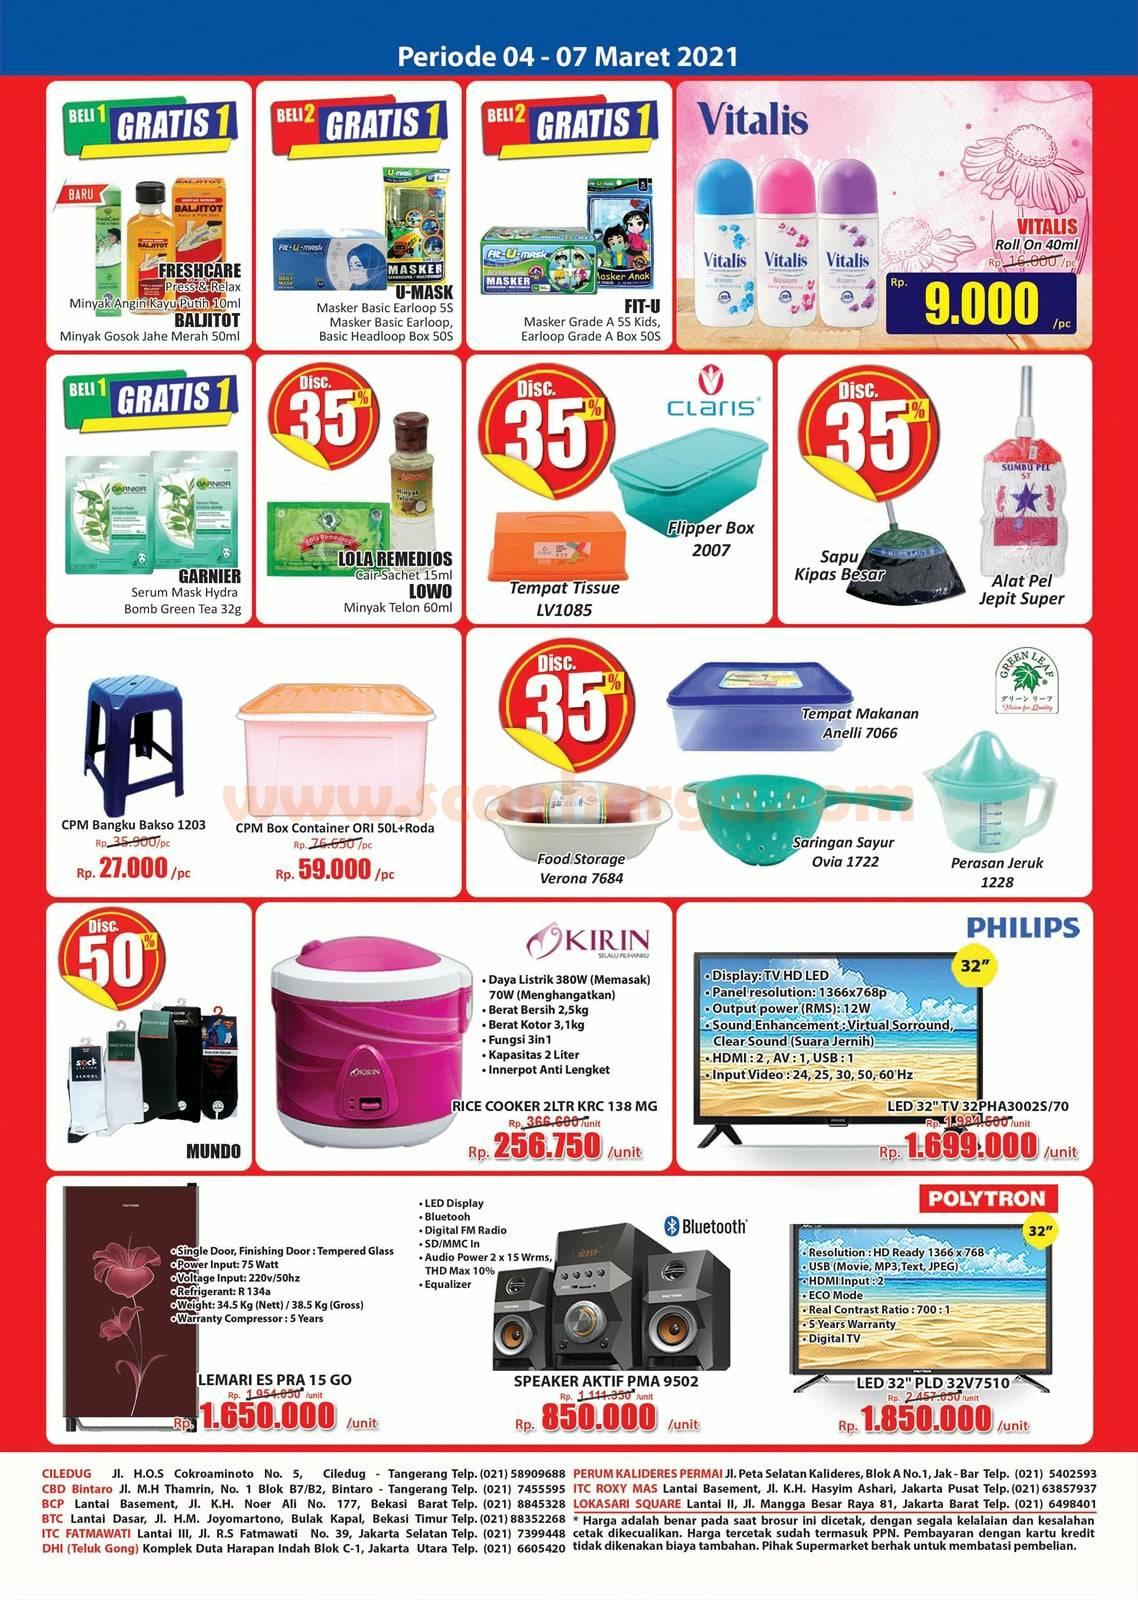 Katalog Promo JSM Hari Hari Swalayan Weekend 4 - 7 Maret 2021 4